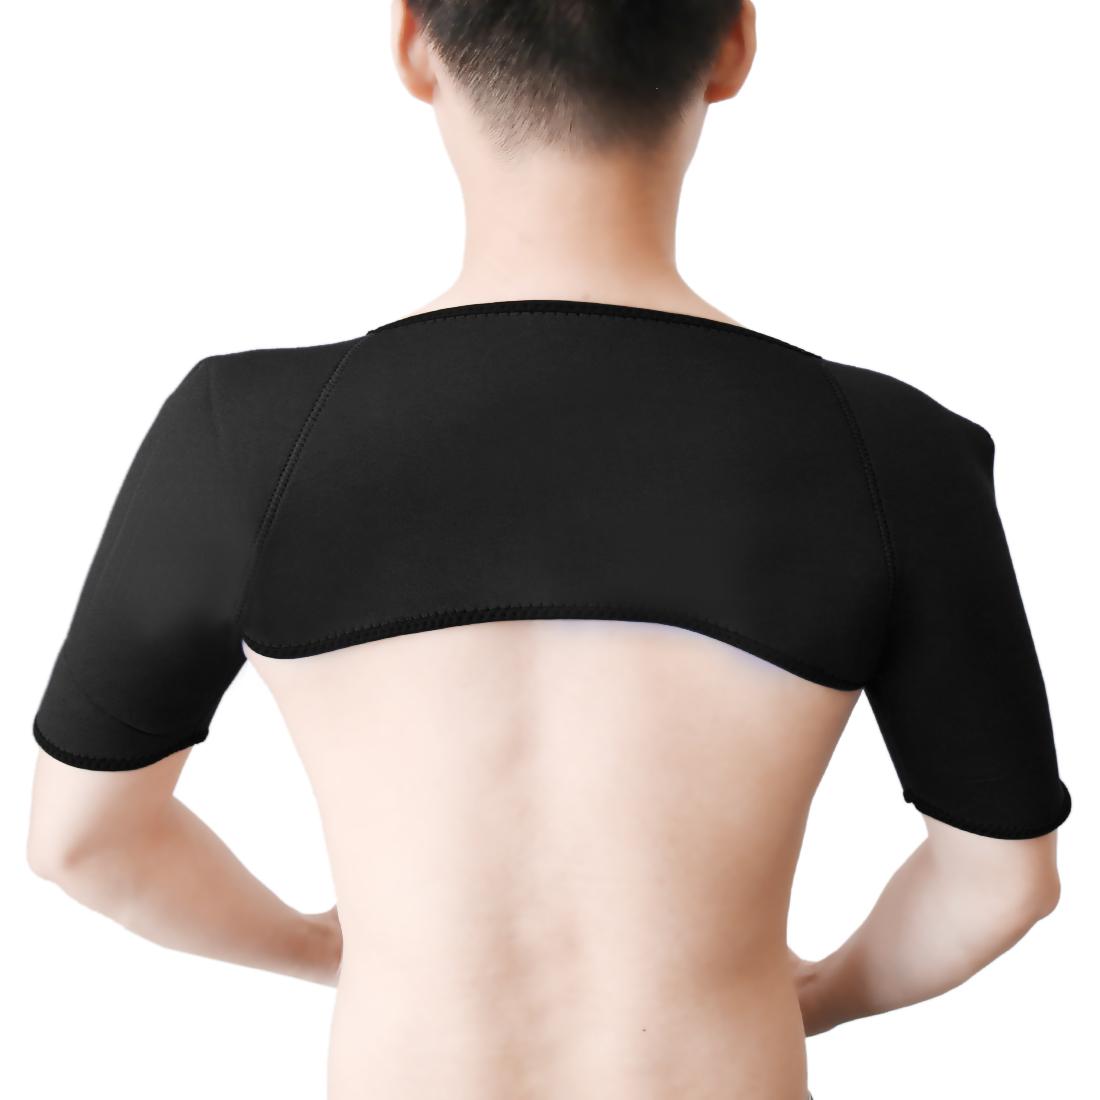 Neoprene Elastic Sports Protect Double Shoulder Brace Support